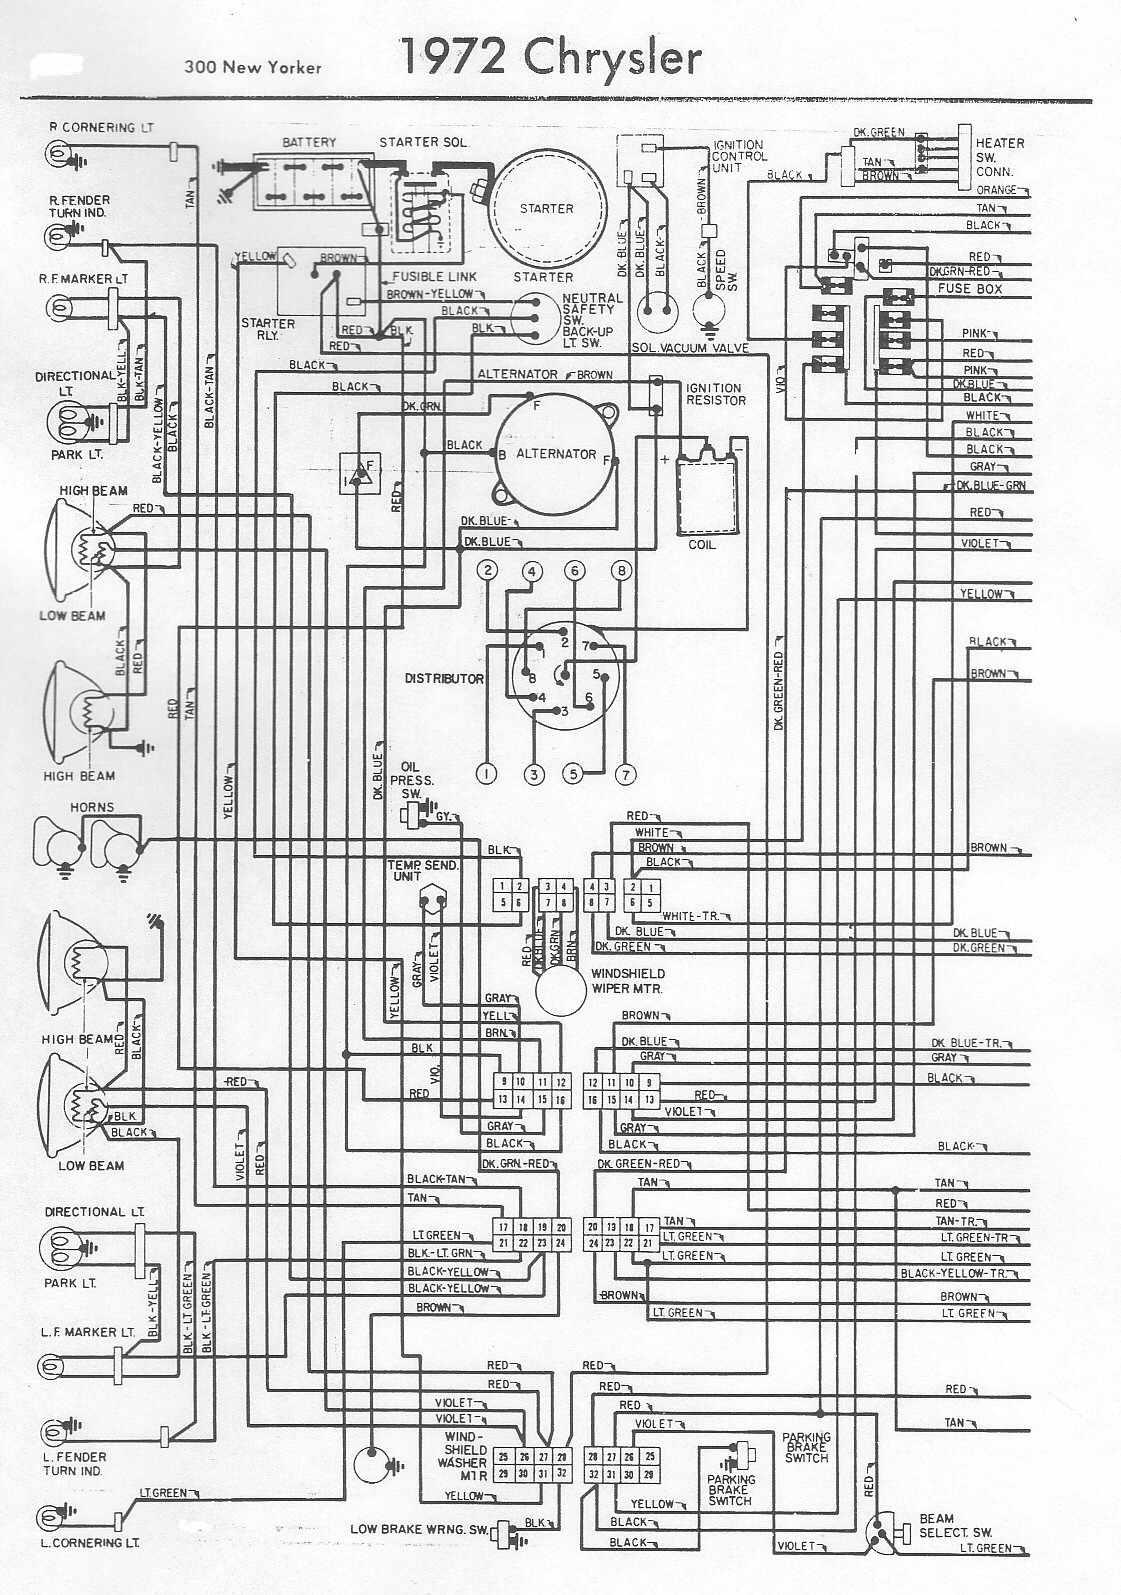 alfa romeo 147 wiring diagram pdf alfa romeo 147 wiring diagram